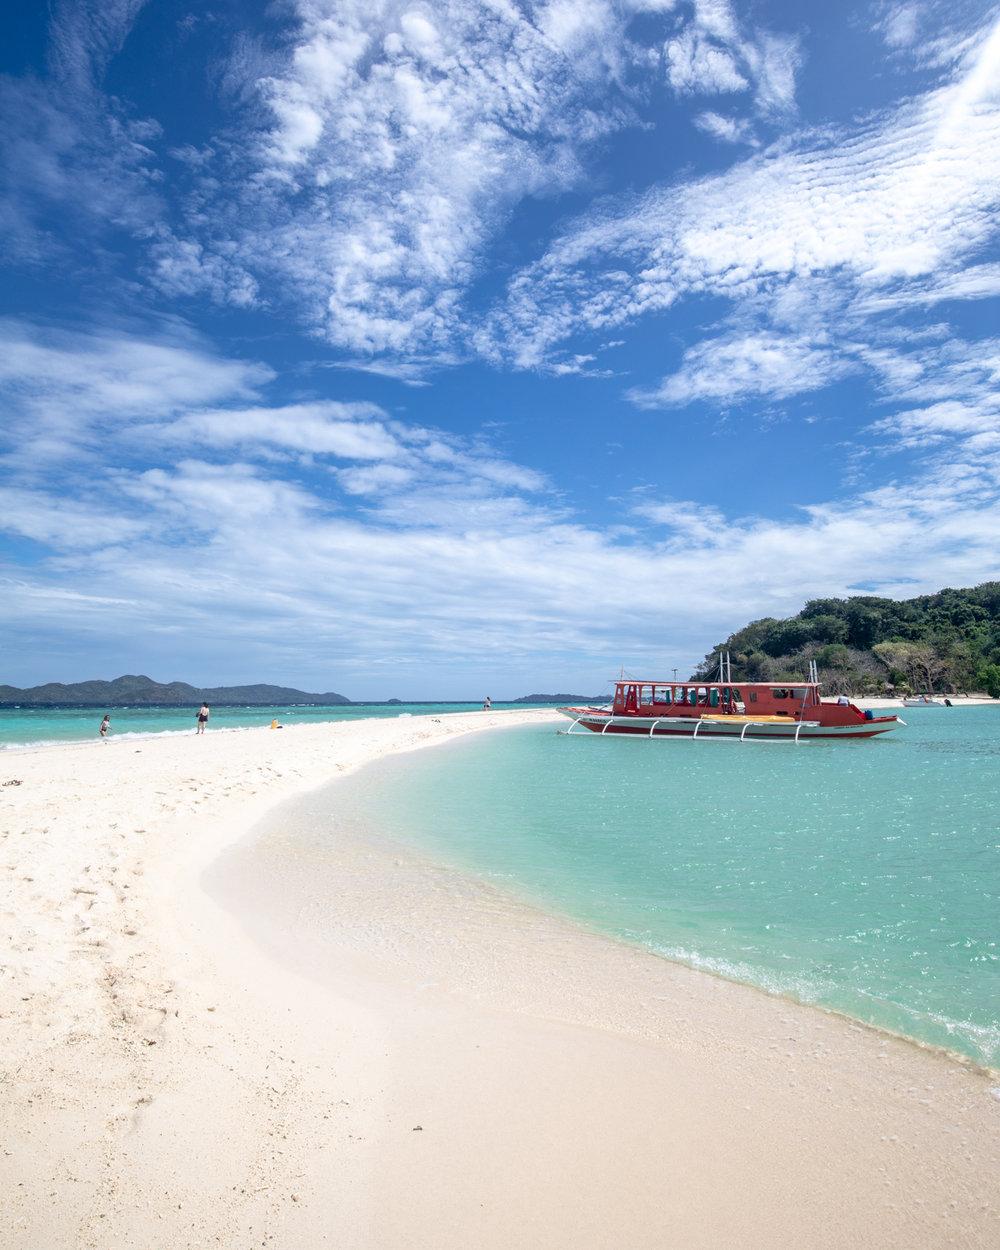 Paradise Islands in Coron, Palawan